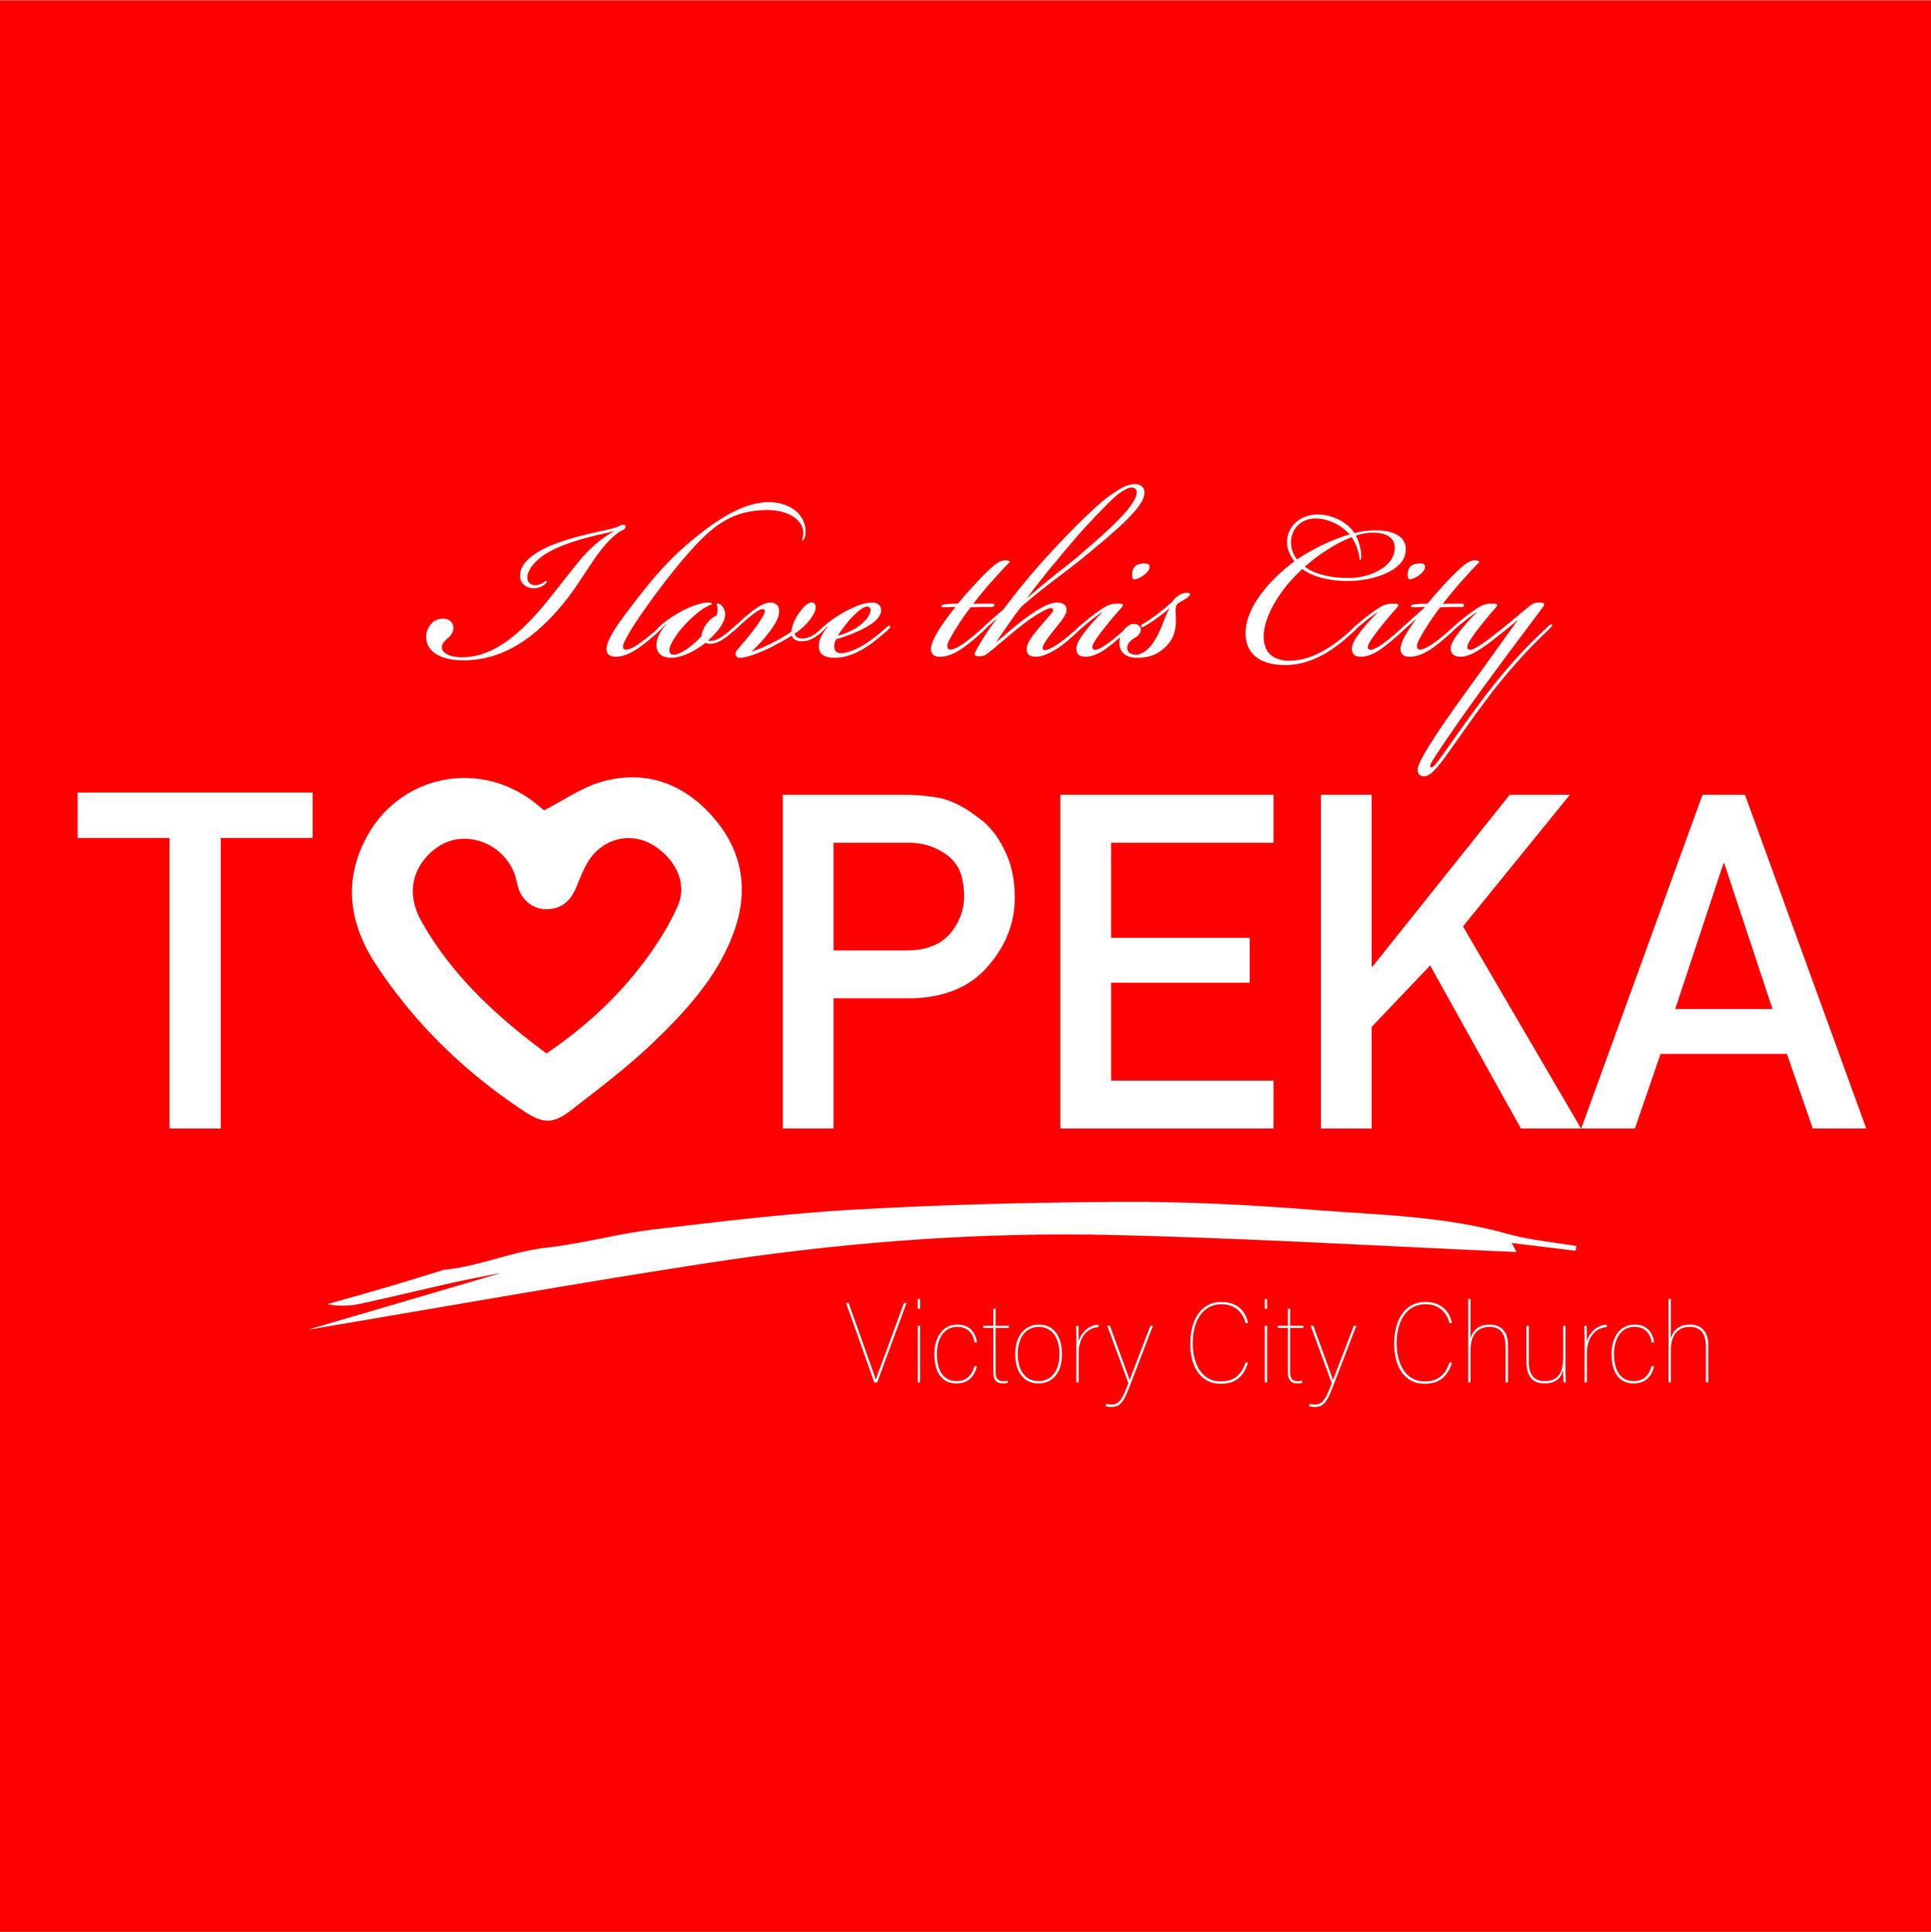 Heart the City Tshirt logo 12x 12 with church name.jpg